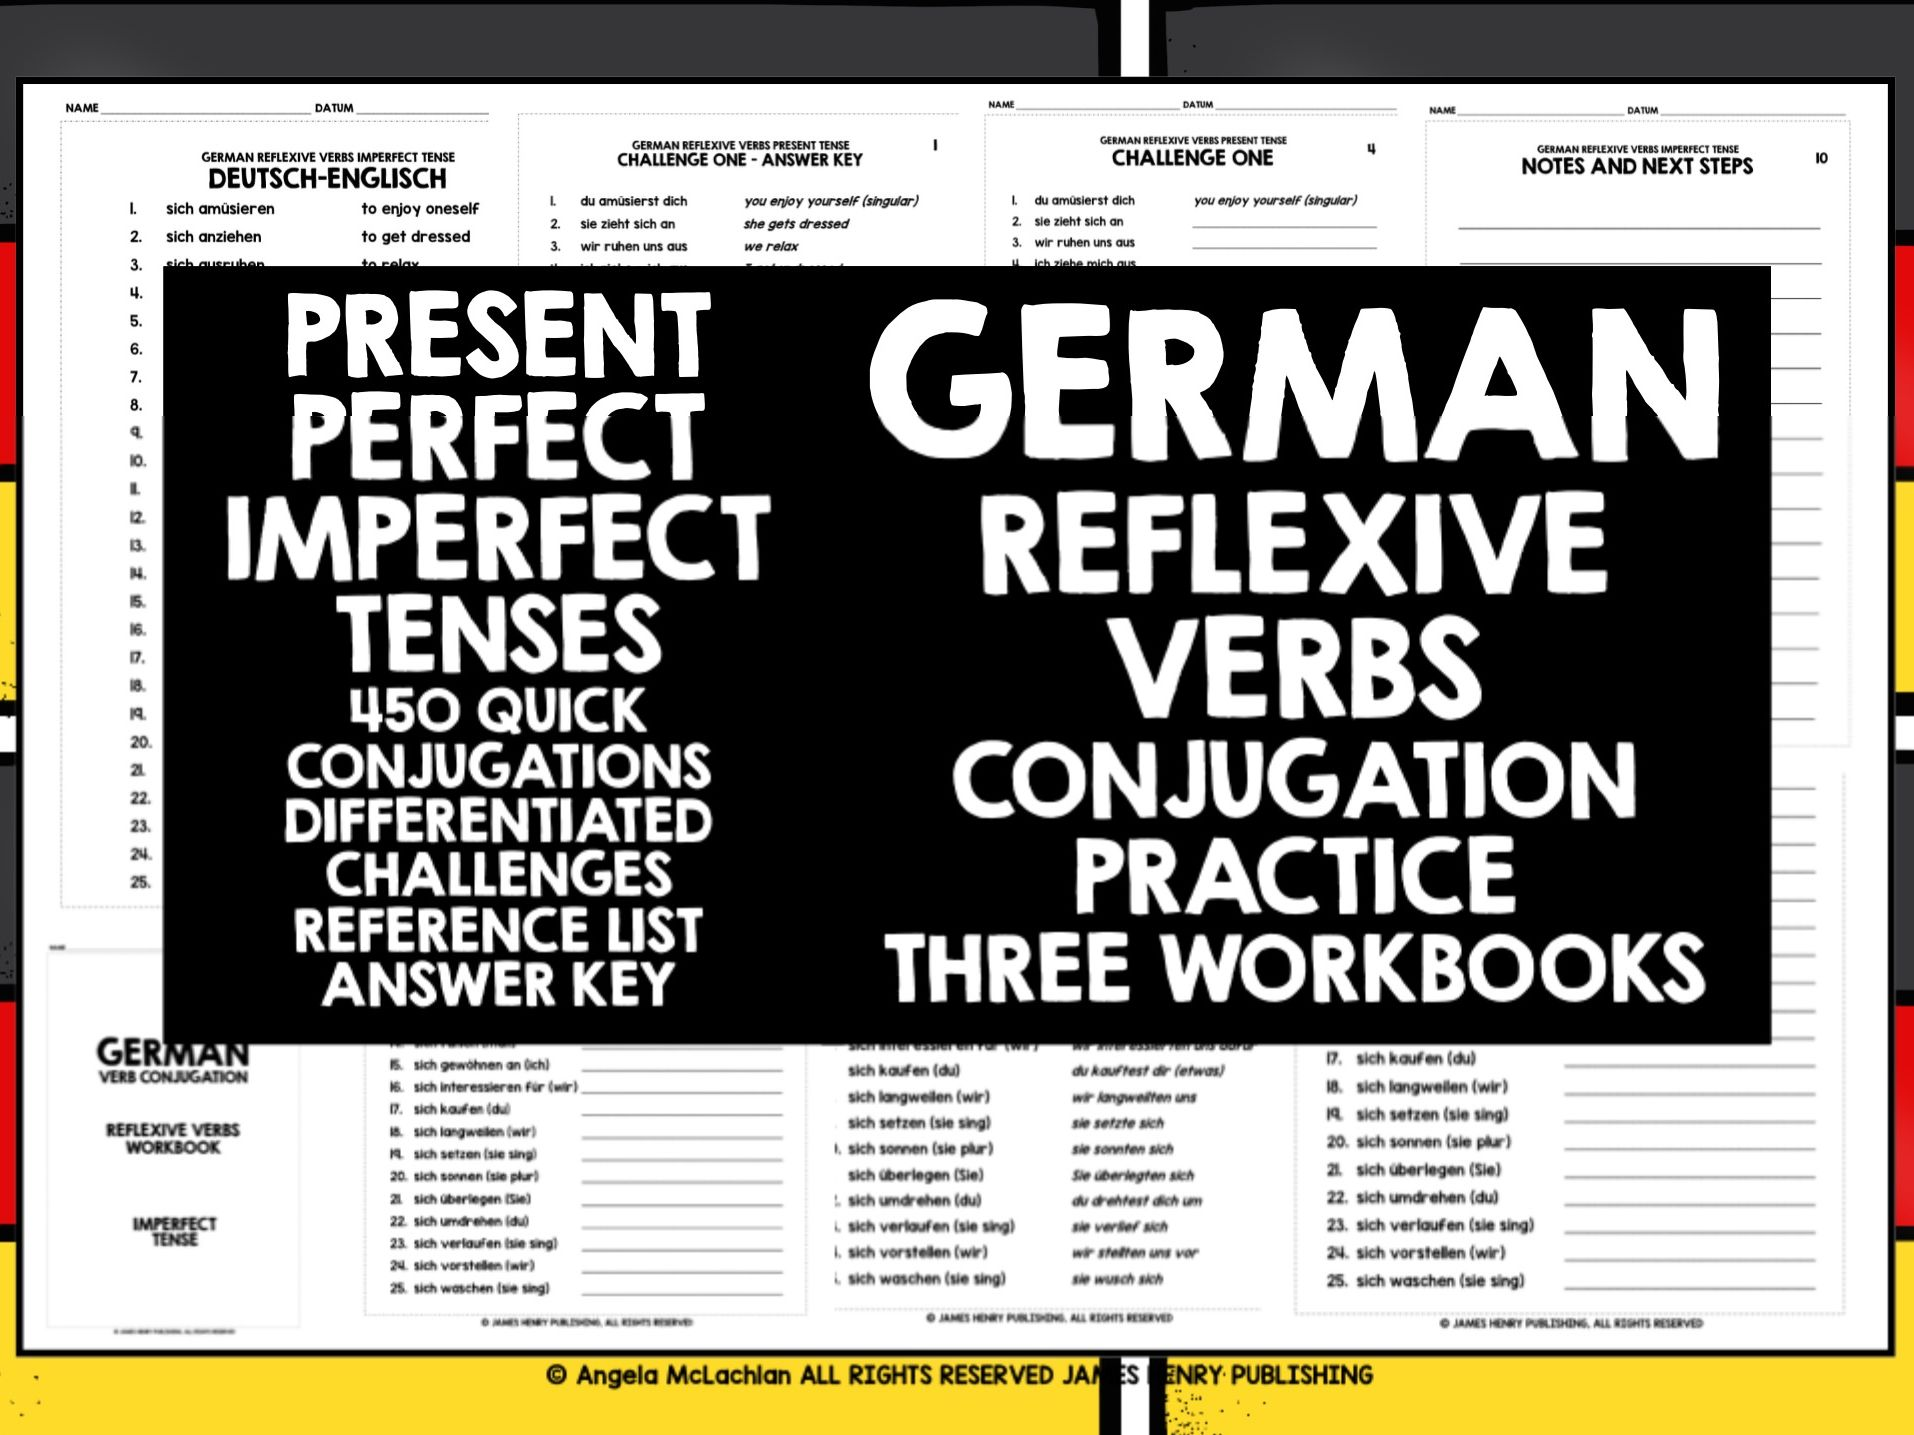 GERMAN REFLEXIVE VERBS 3 TENSES